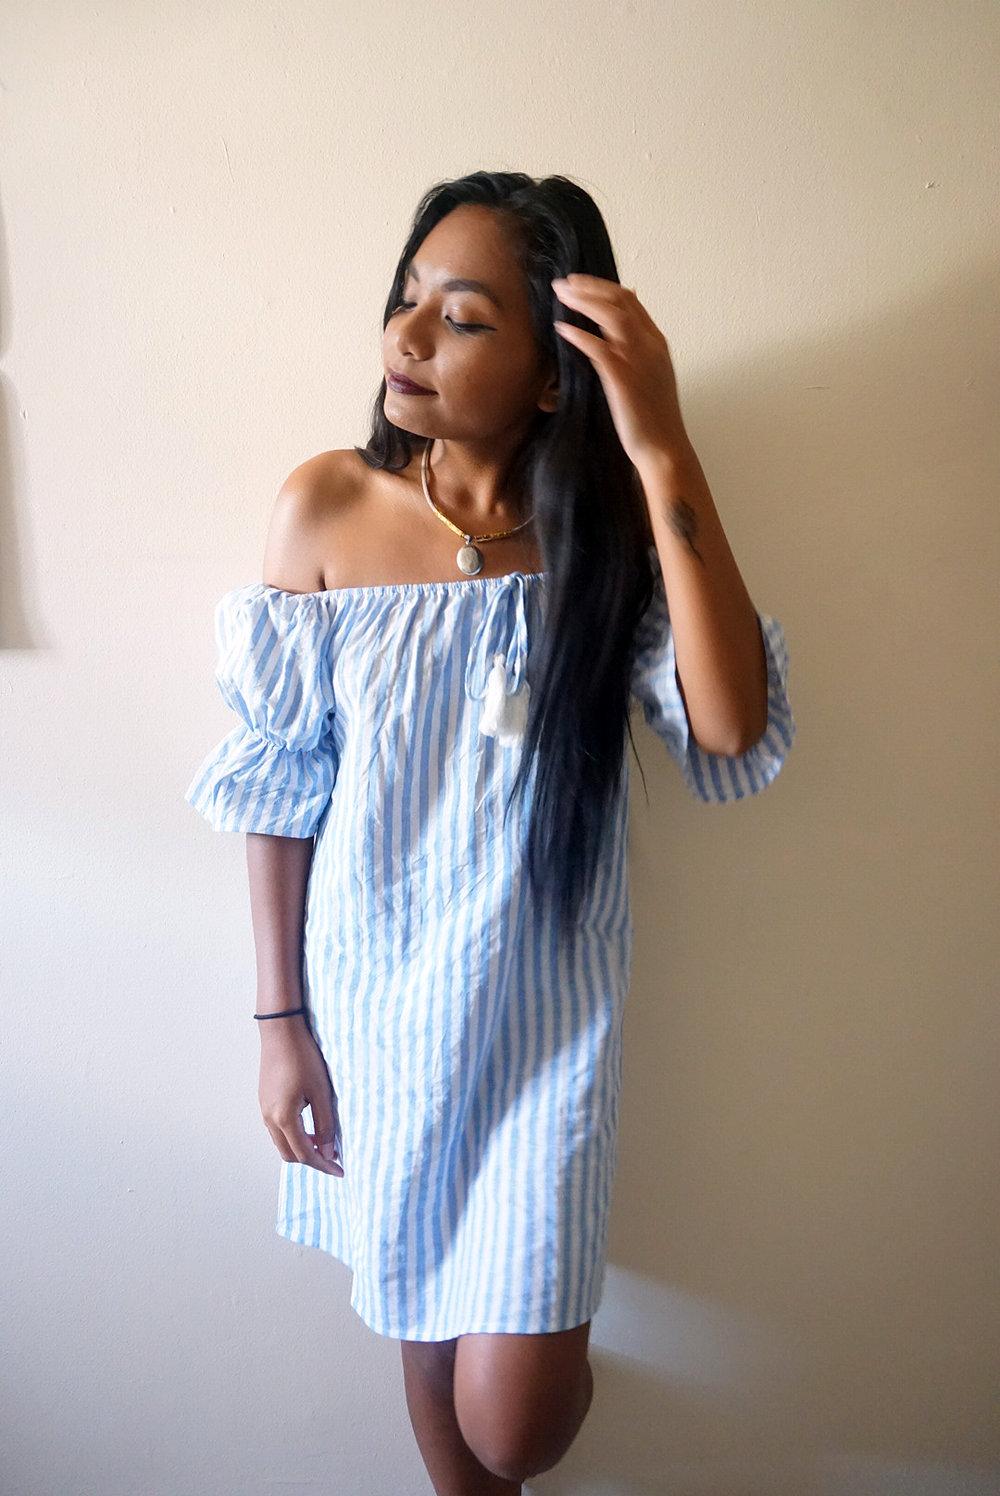 Off-the-shoulder-striped-dress-summer-fall-style-blogger-LINDATENCHITRAN-1-1616x1080.jpg